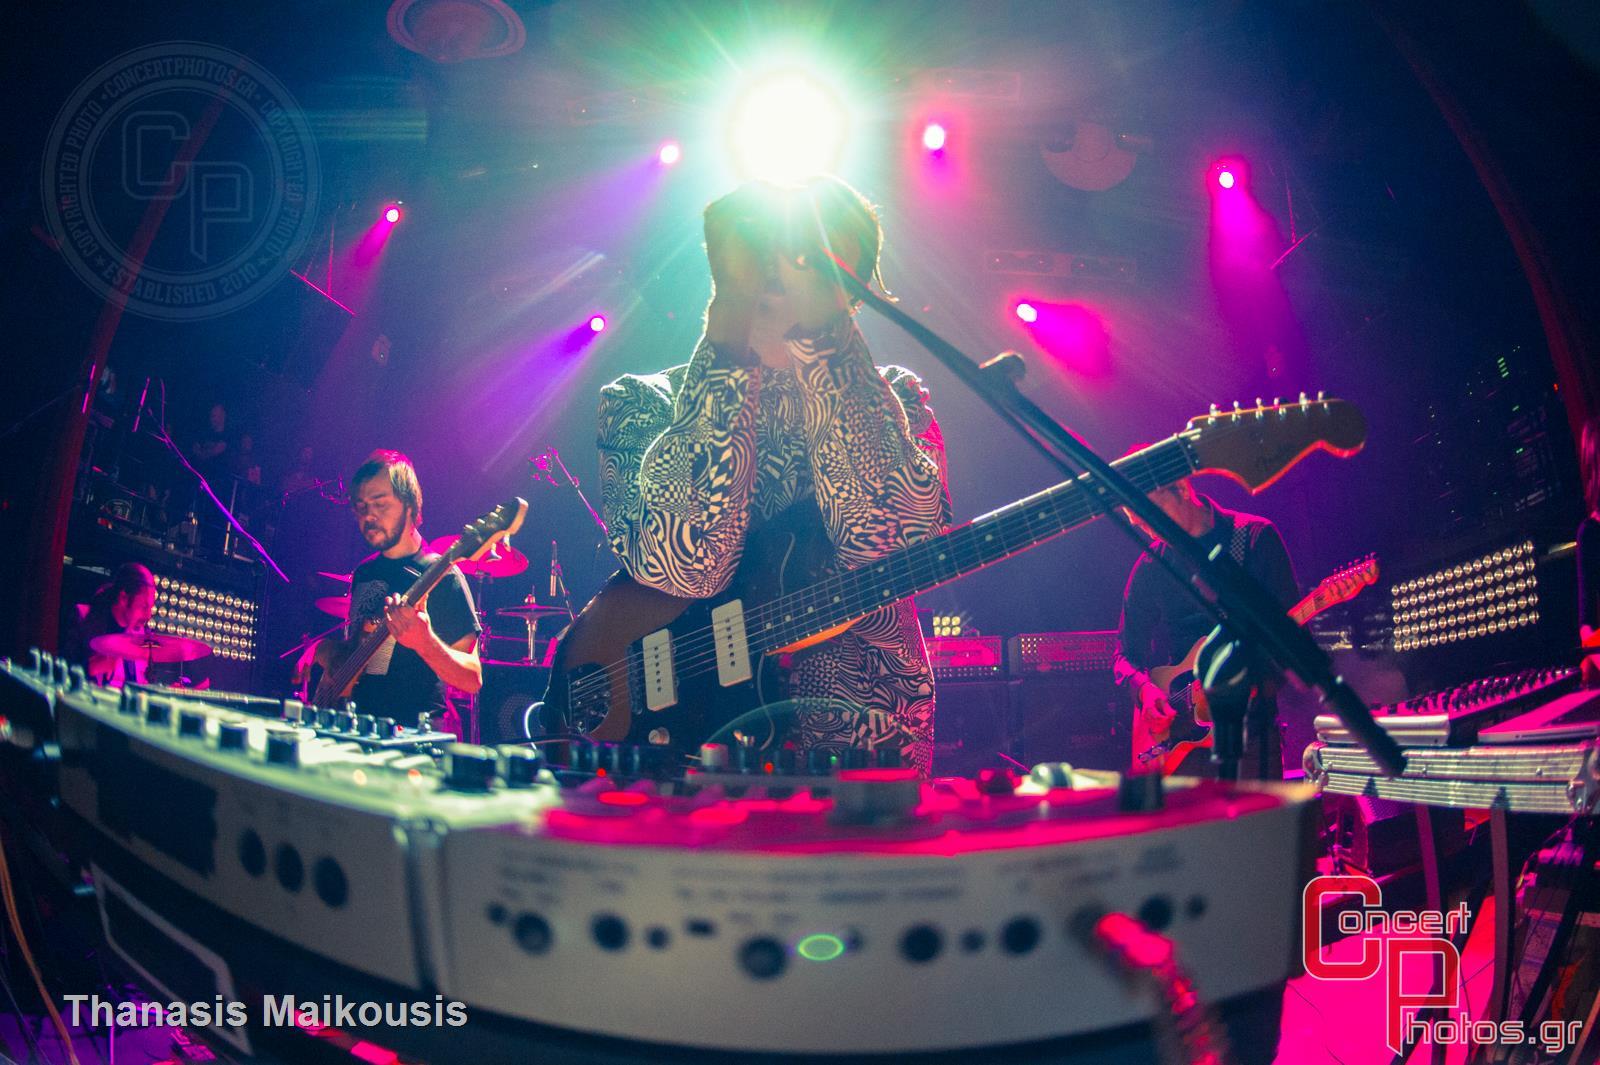 Tricky - Spectralfire-Tricky - Spectralfire photographer: Thanasis Maikousis - concertphotos_-3459